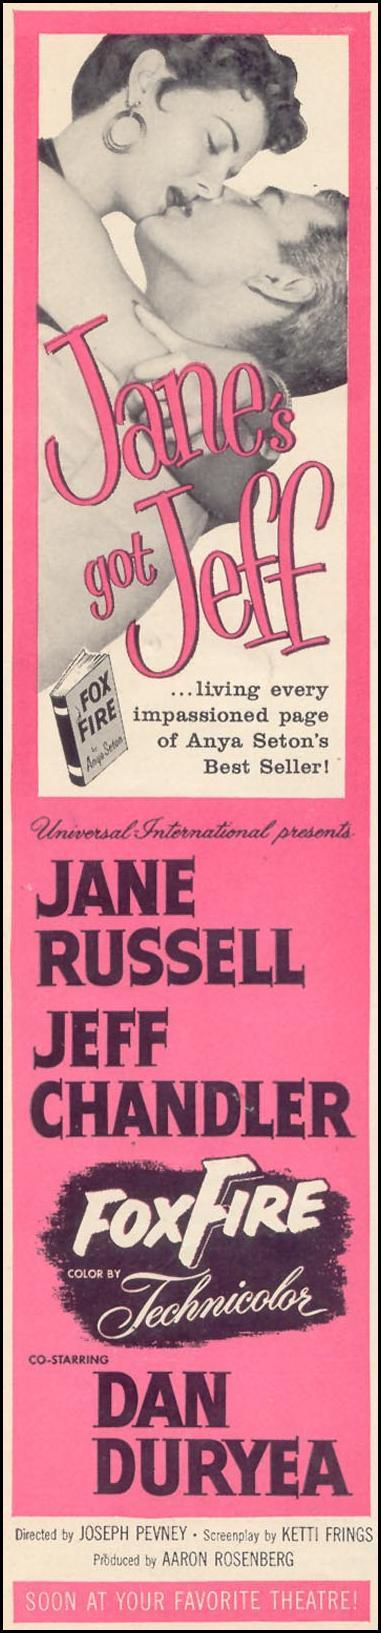 FOXFIRE WOMAN'S DAY 07/01/1955 p. 8